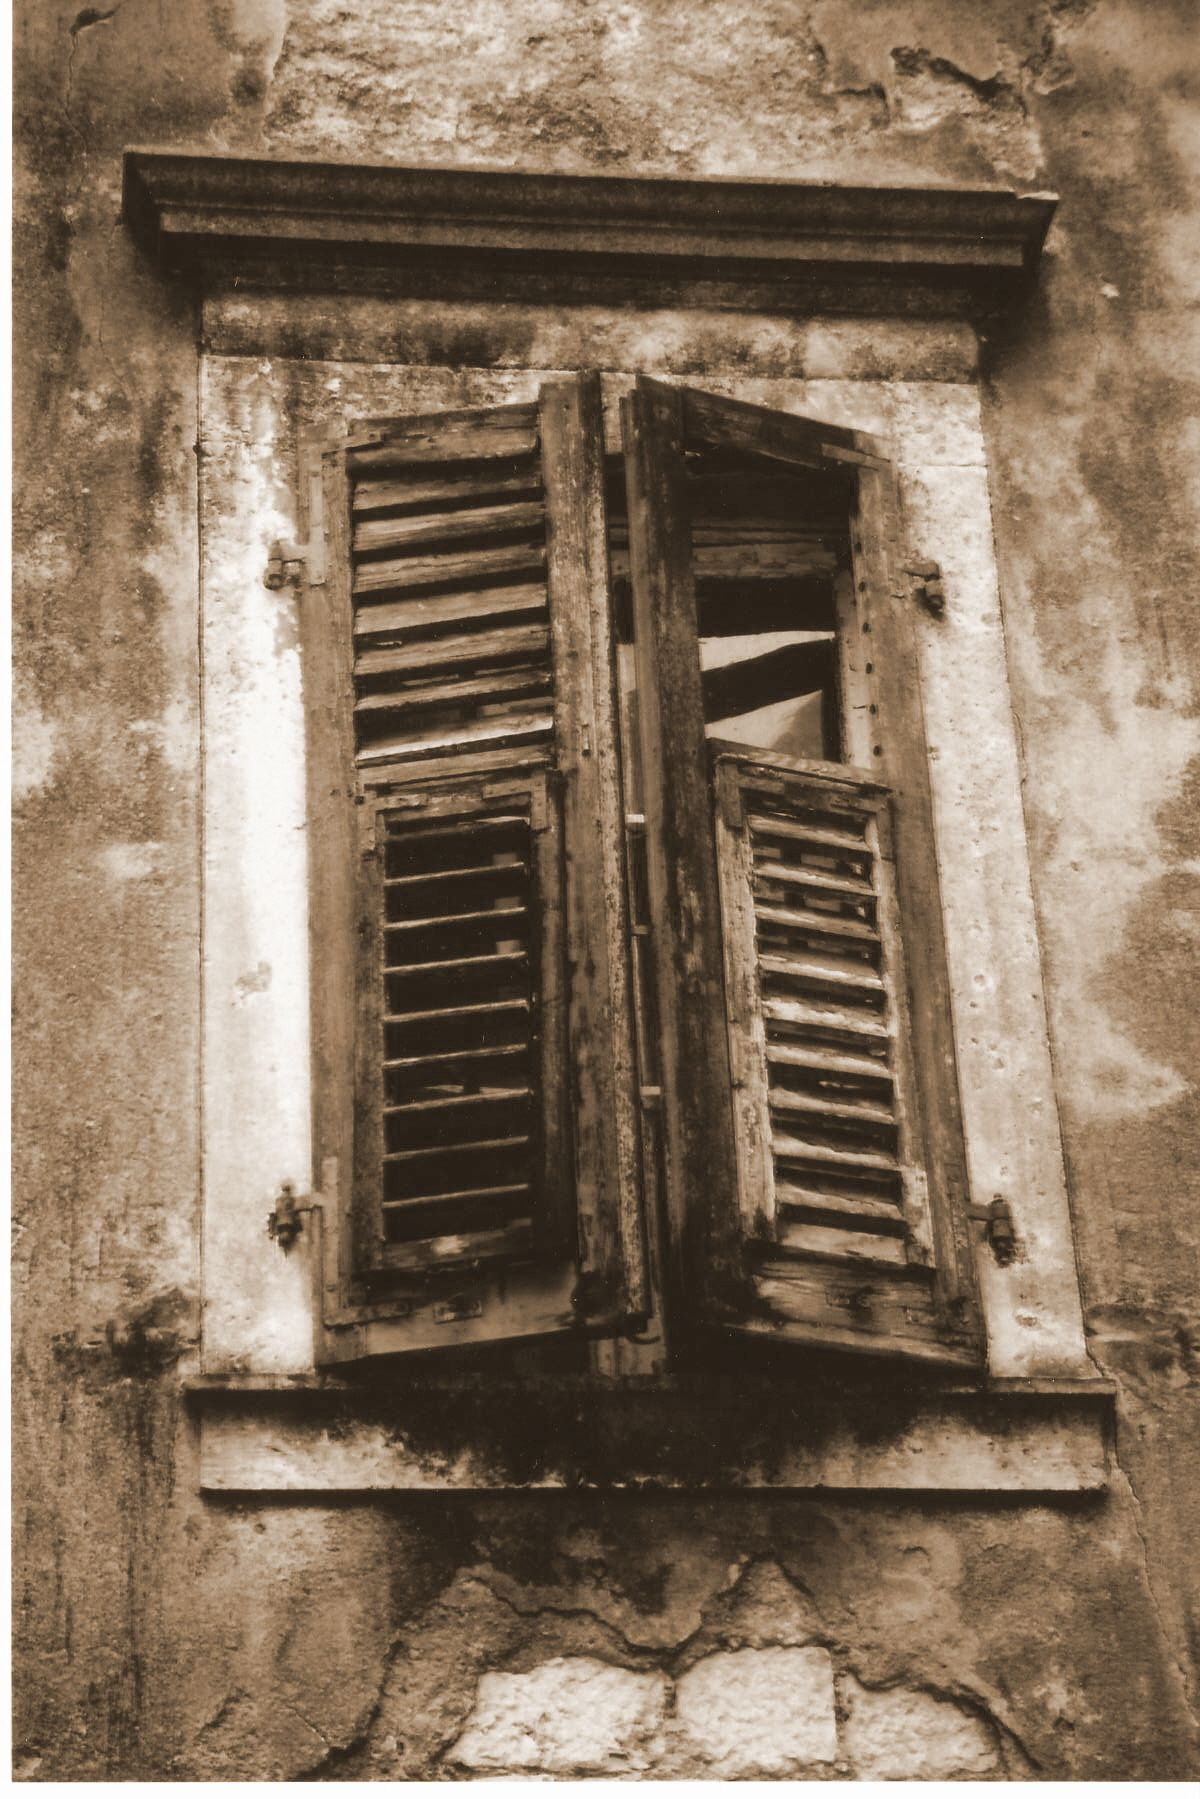 Pin By Eric J Kaster On Doorways And Windows Decor Fireplace Doorway